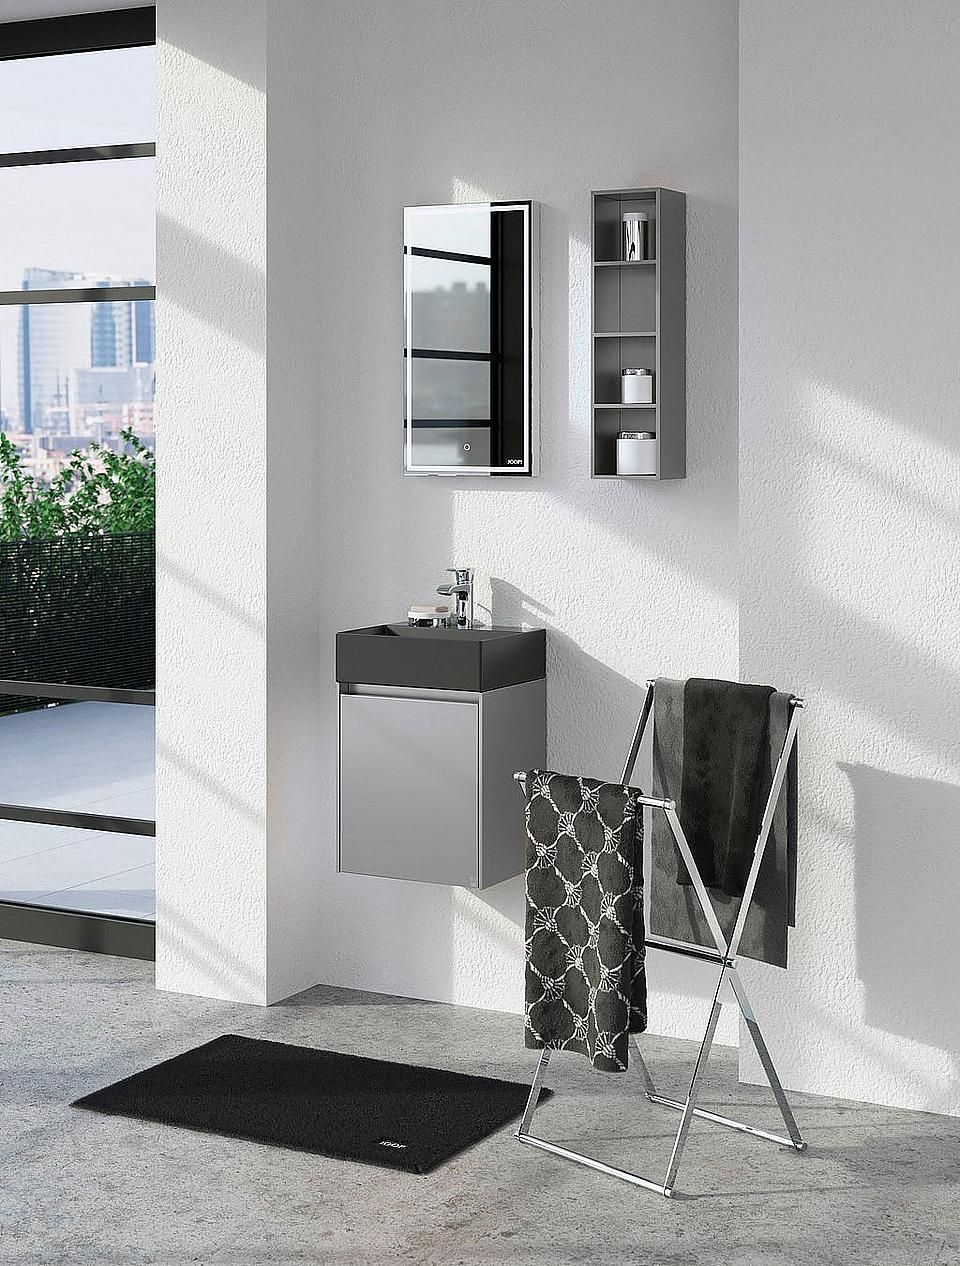 Werbung Verlinkung B A T H R O O M D E S I G N Bath Bathroom Bathroomdesign Bathroomdetails Joop Joopliving Interio Interior Joop Living